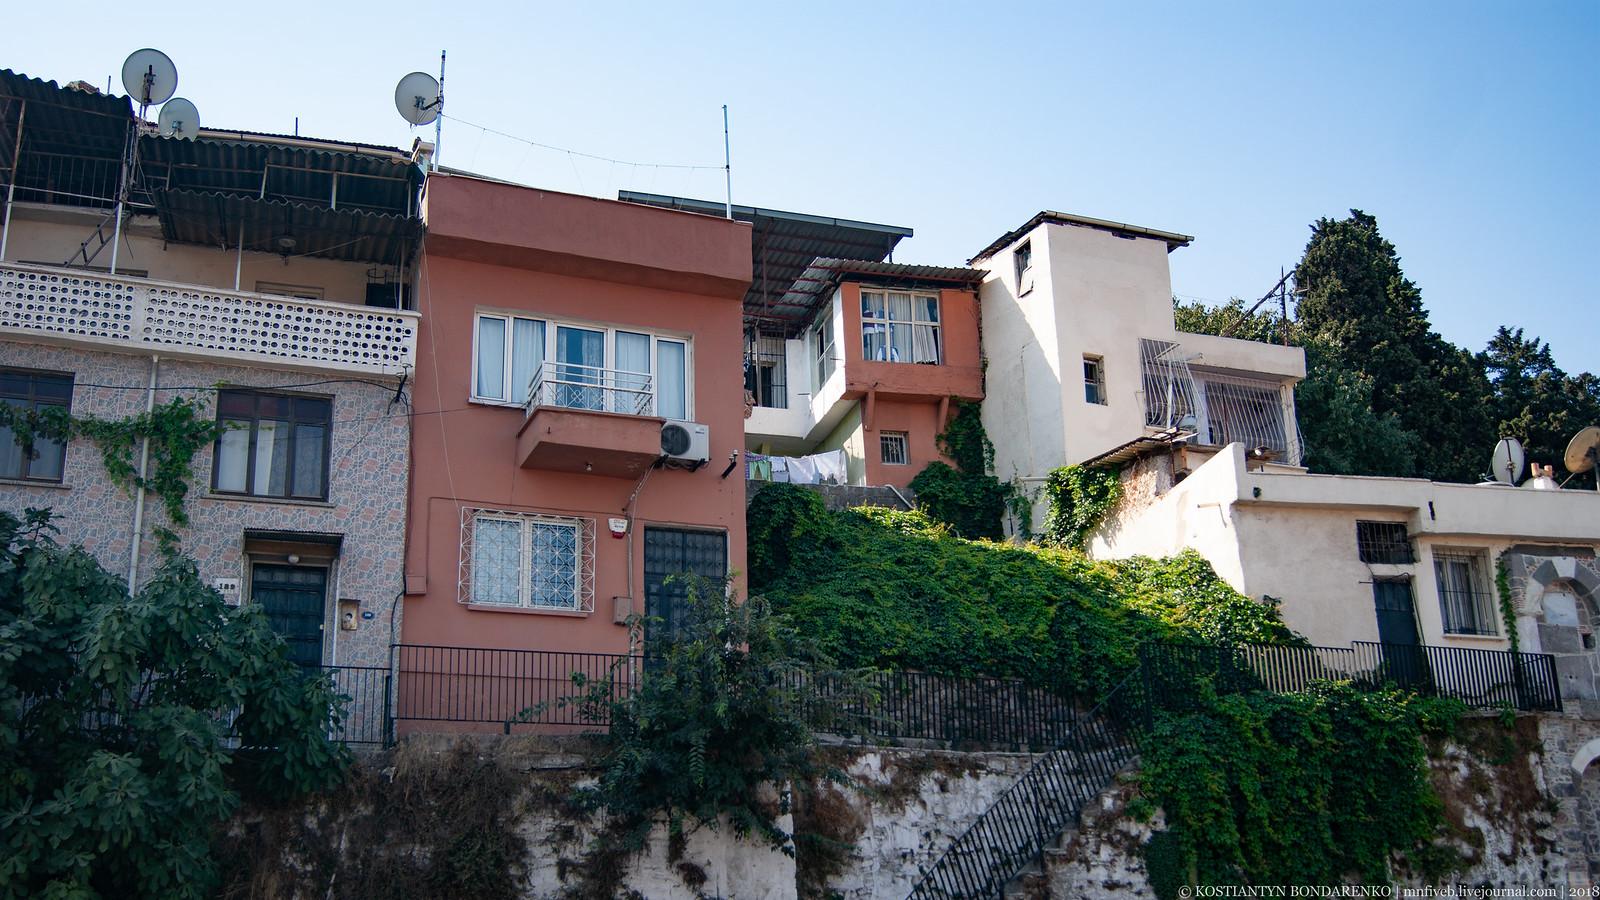 20180821 - Izmir-55